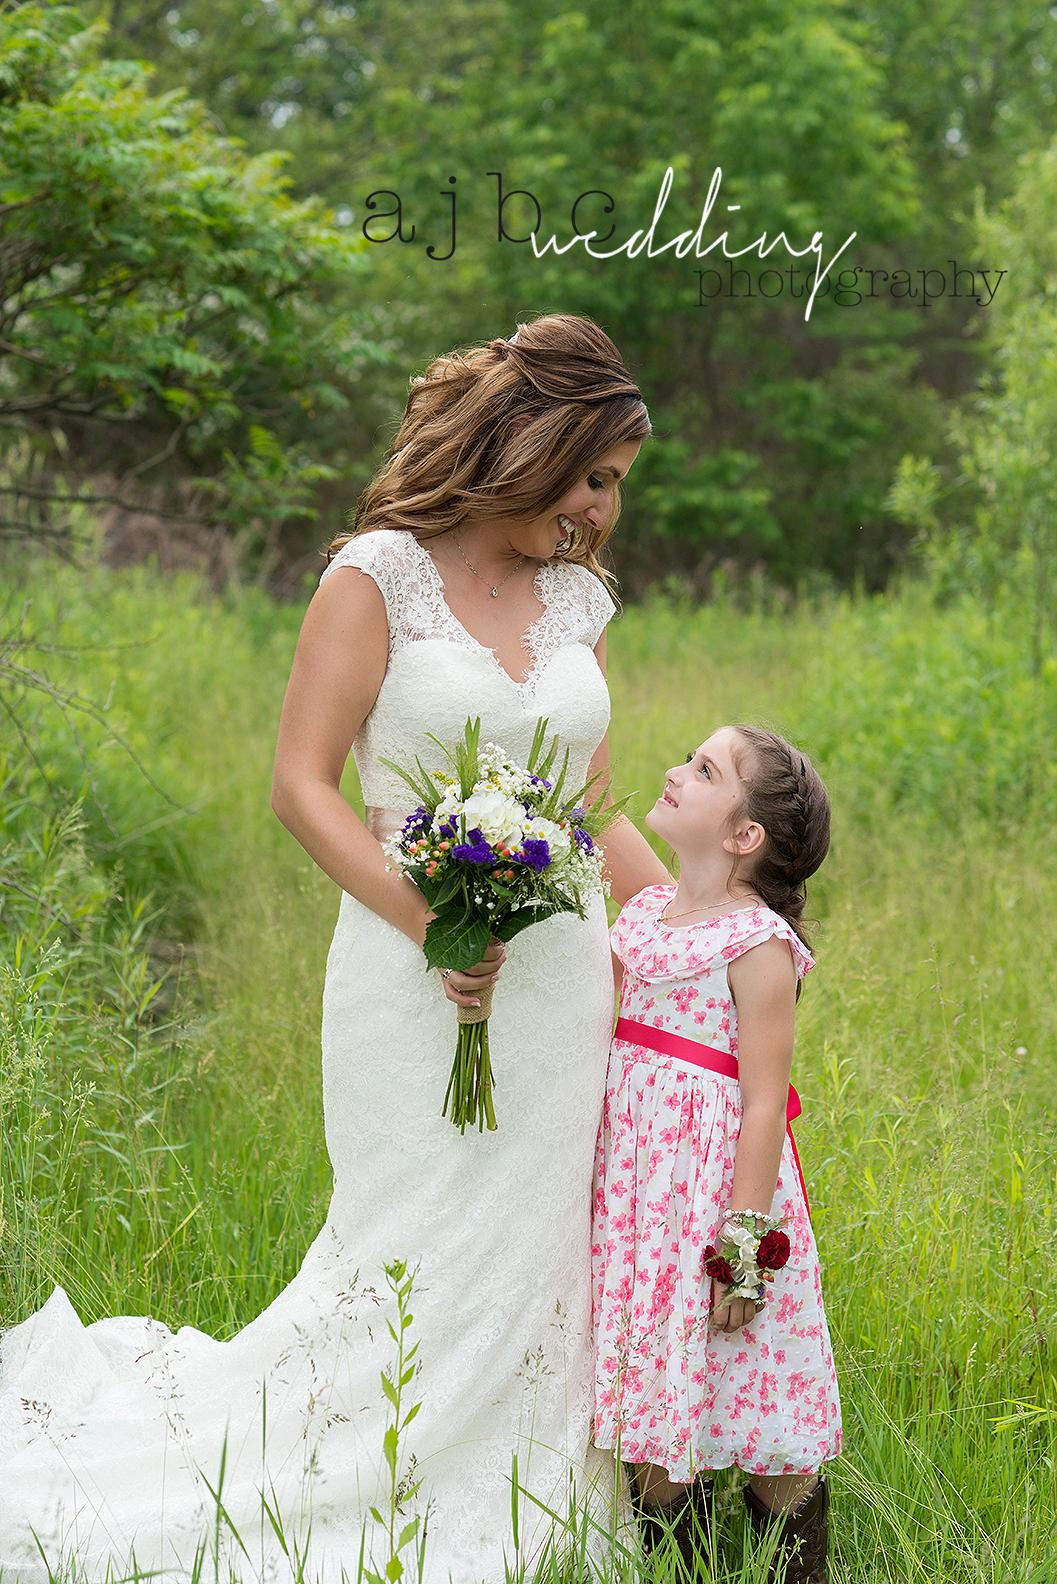 ajbcphotography-port-huron-michigan-wedding-photographer-outdoors-summer-wedding-country-wedding-wadhams-michigan-bride-vintage-wedding-flowergirl.jpg